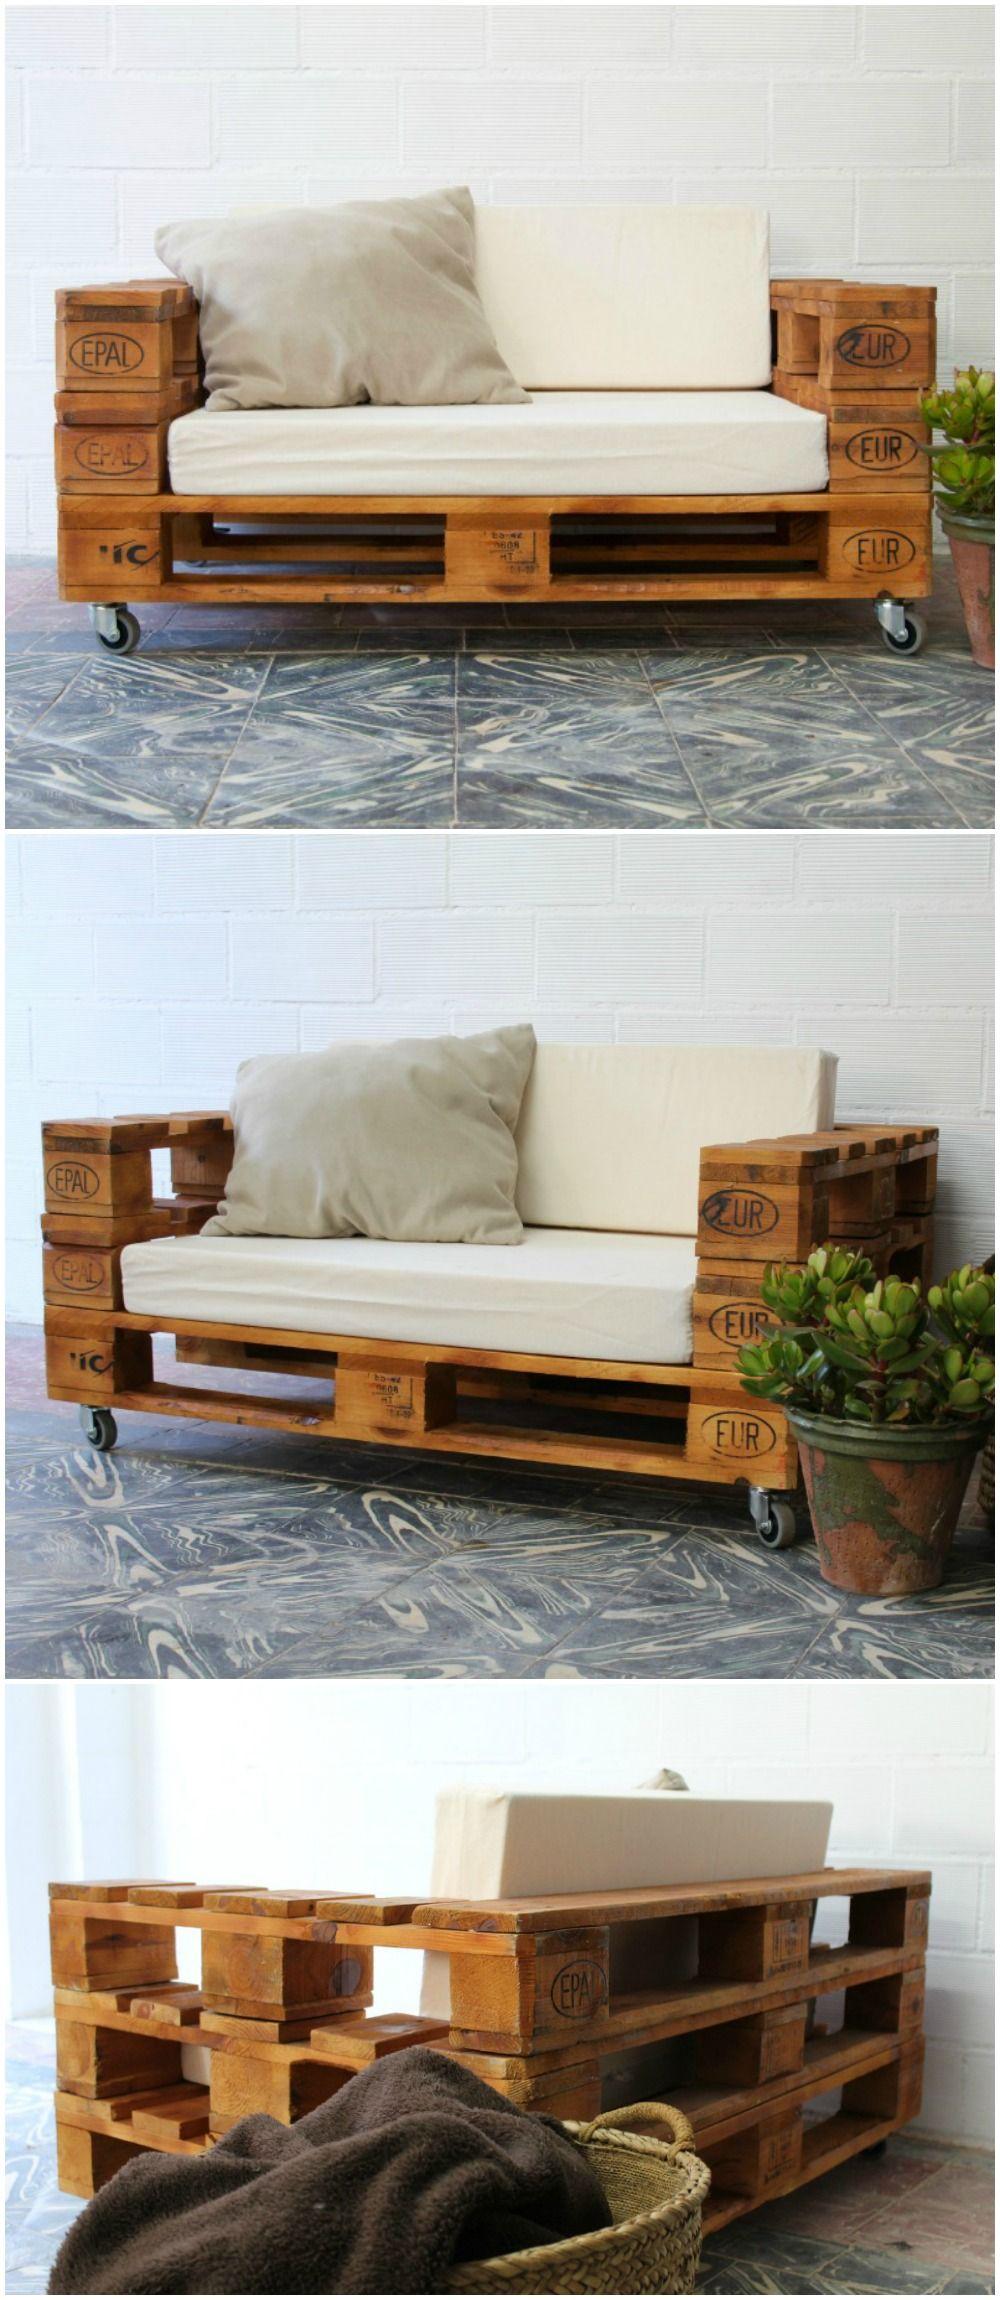 ALMANZOR sof palets 120x80cm  Sof con Palets  Sofas